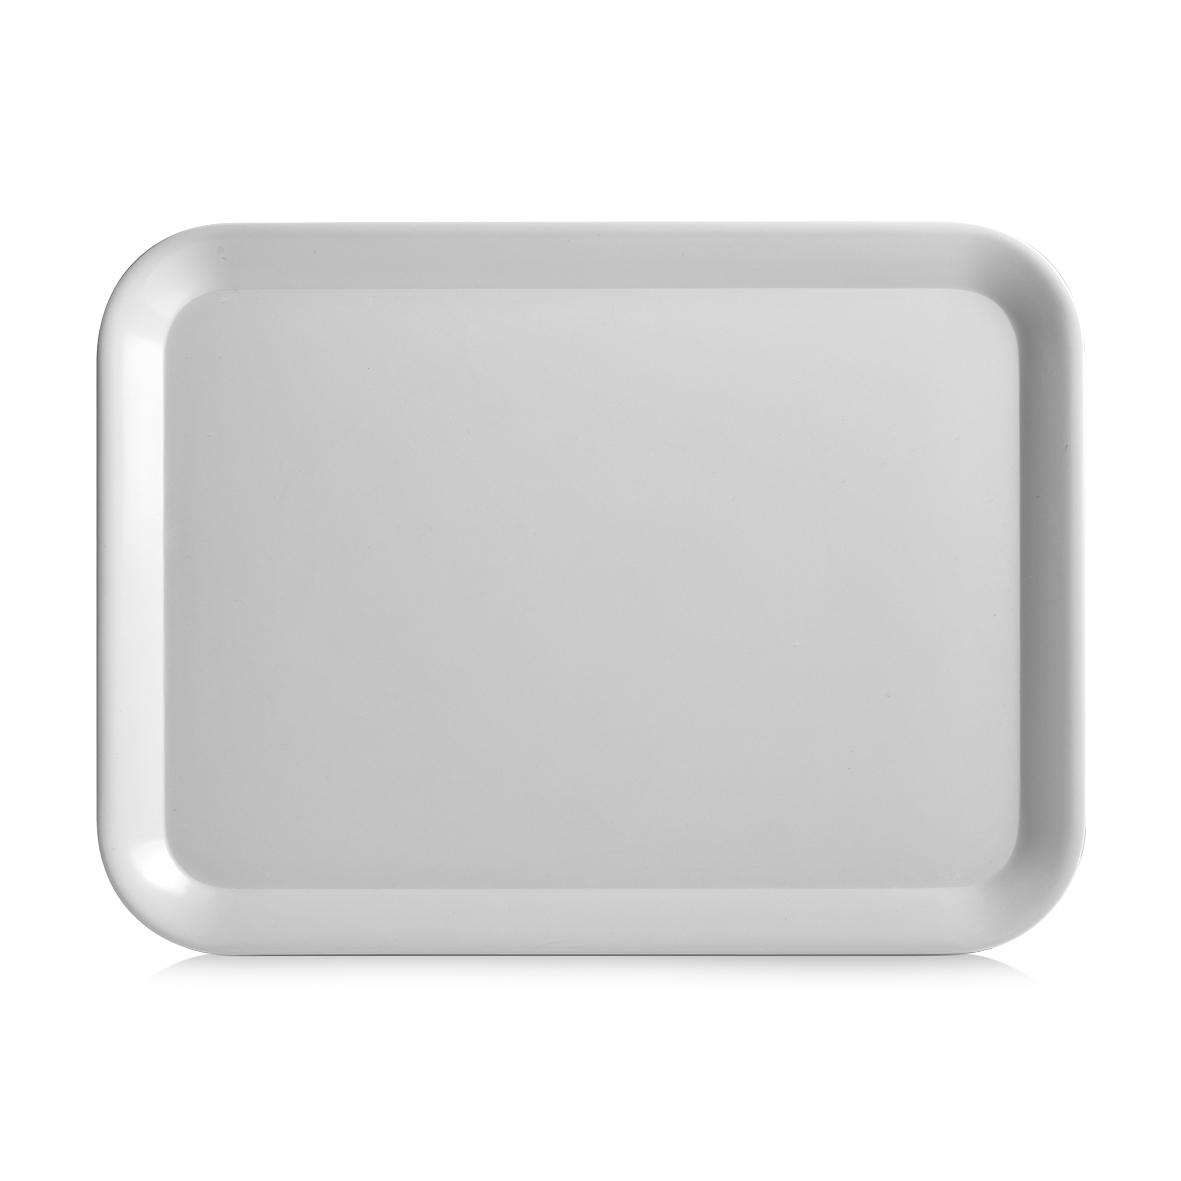 Tava pentru servire Aqua, Melamina, l43,5xA32,5 cm-Gri